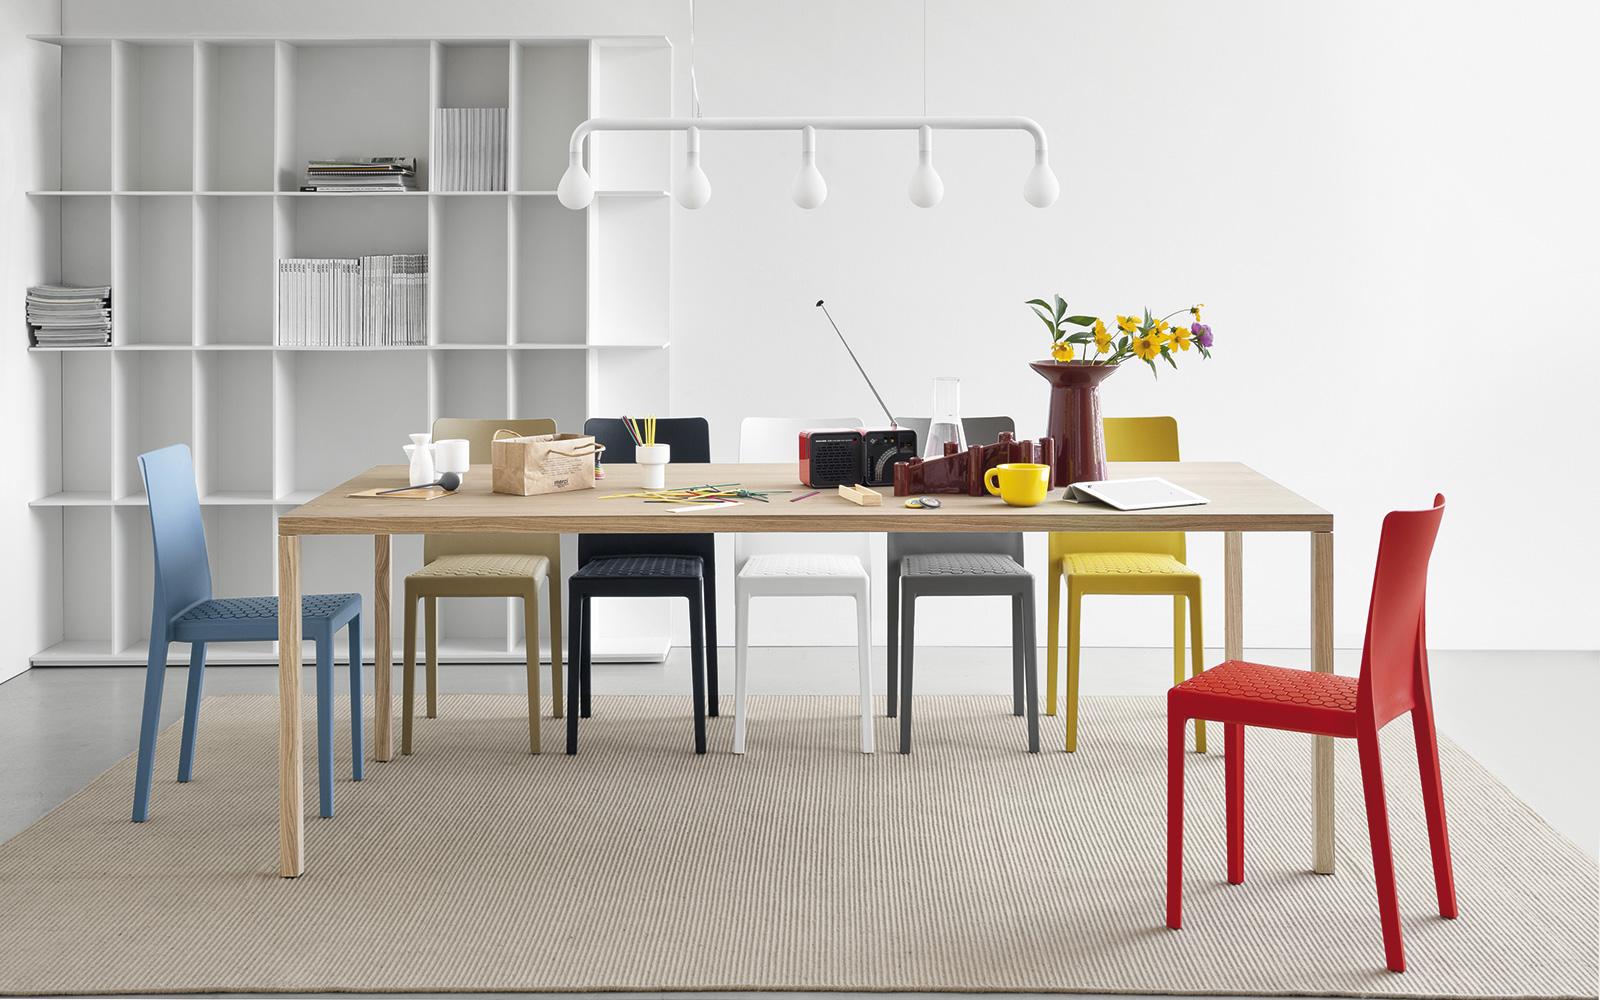 Sedie Rosse Calligaris : Tavolo con sedie dallalto assya set tavolo e sedie with tavolo